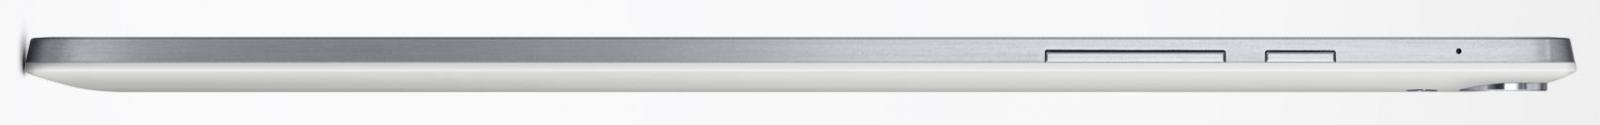 HTC Nexus 9 tablet side view